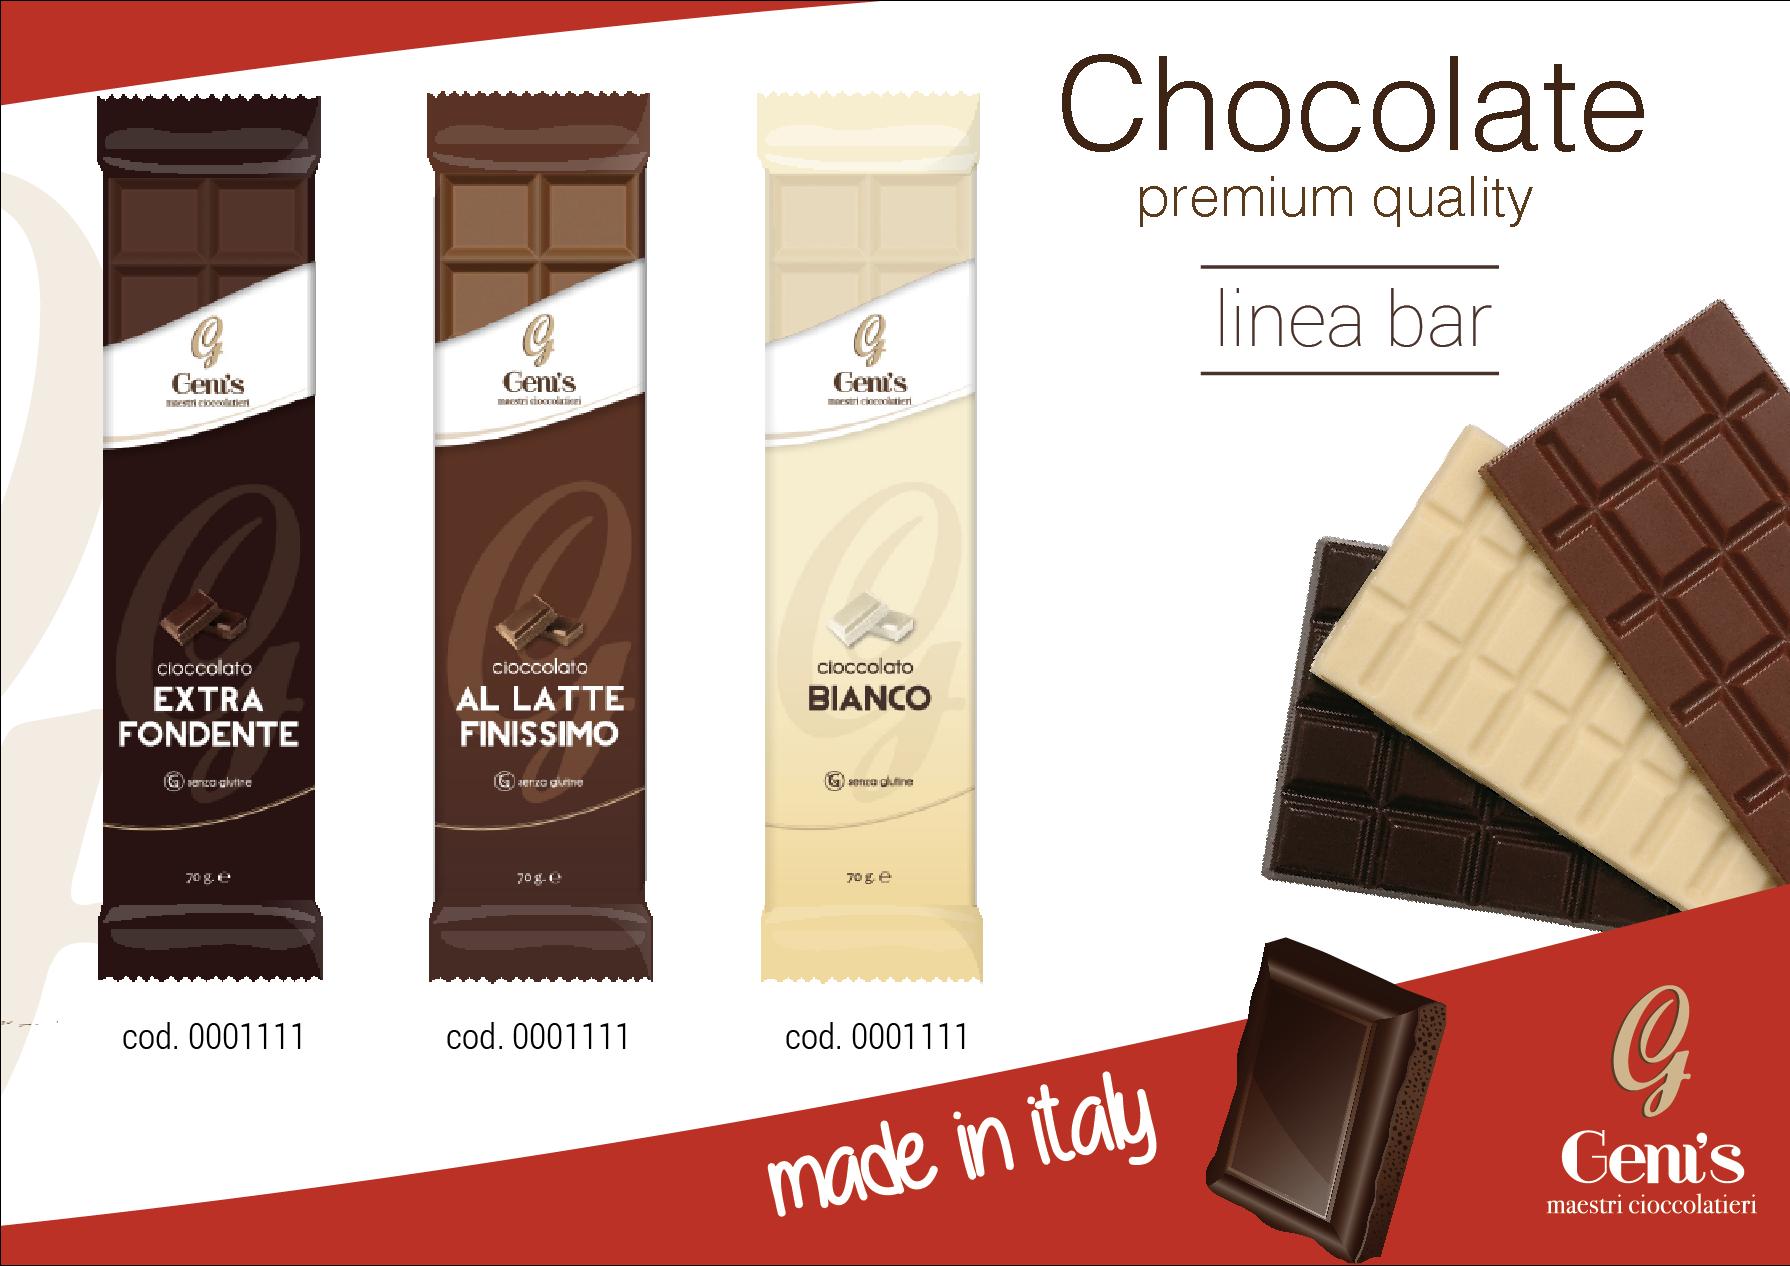 tavolette di cioccolato artigianalie linea bar